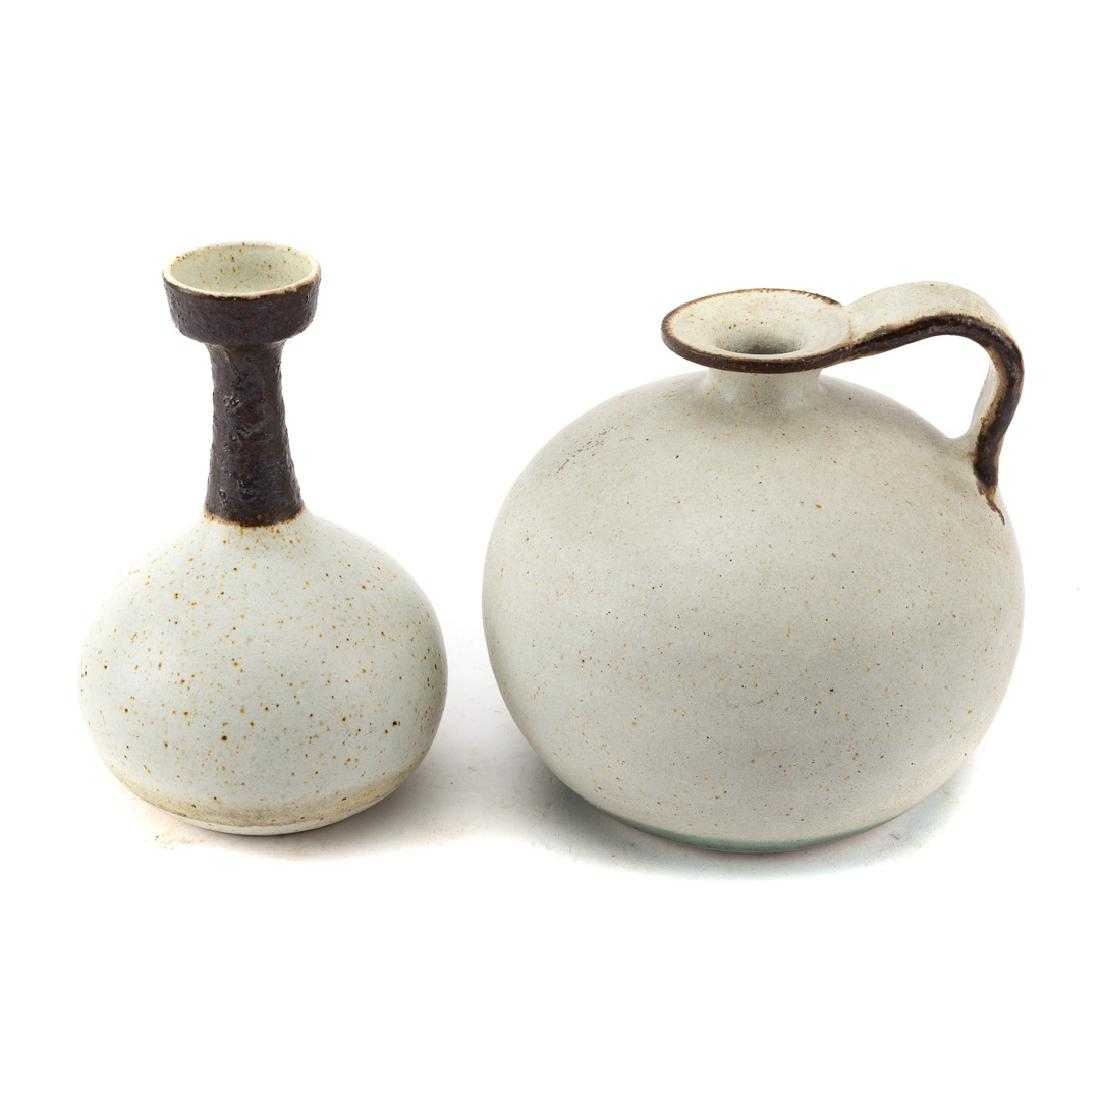 Bruno Gambone Ceramic Vase & Water Vessel by Bruno Gambone